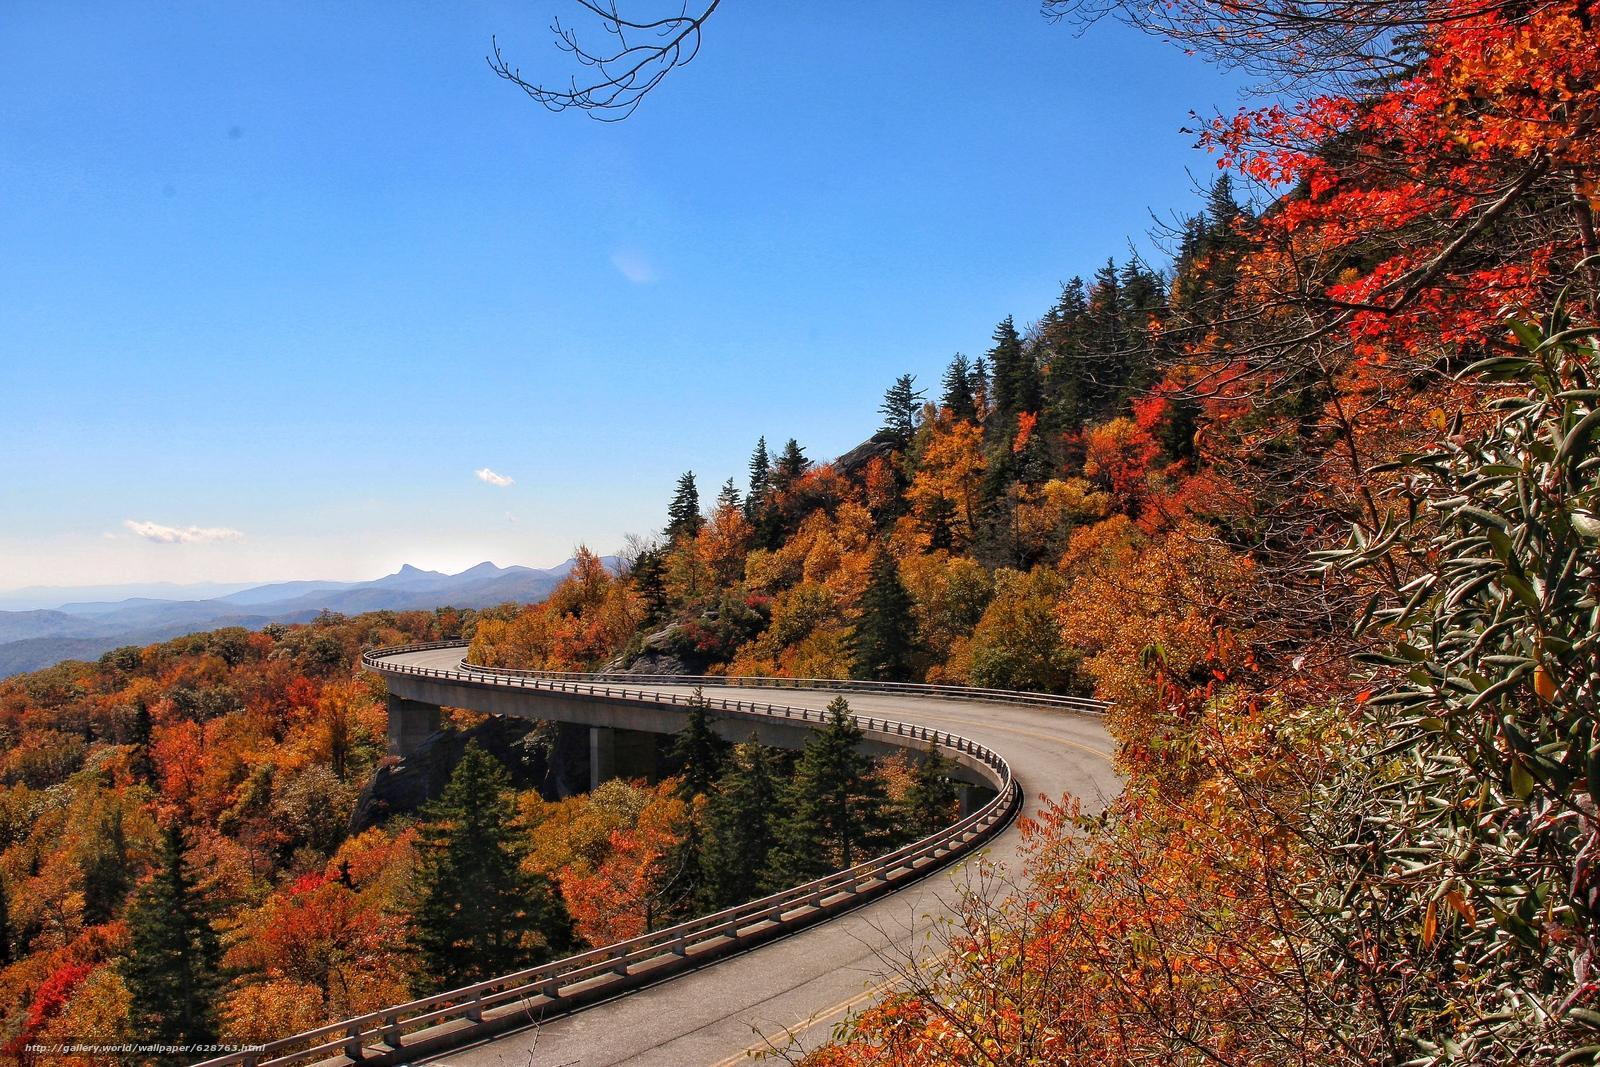 outono, ponte, North Carolina, derevya.peyzazh, Blue Ridge Parkway Linn Cove Viaduct